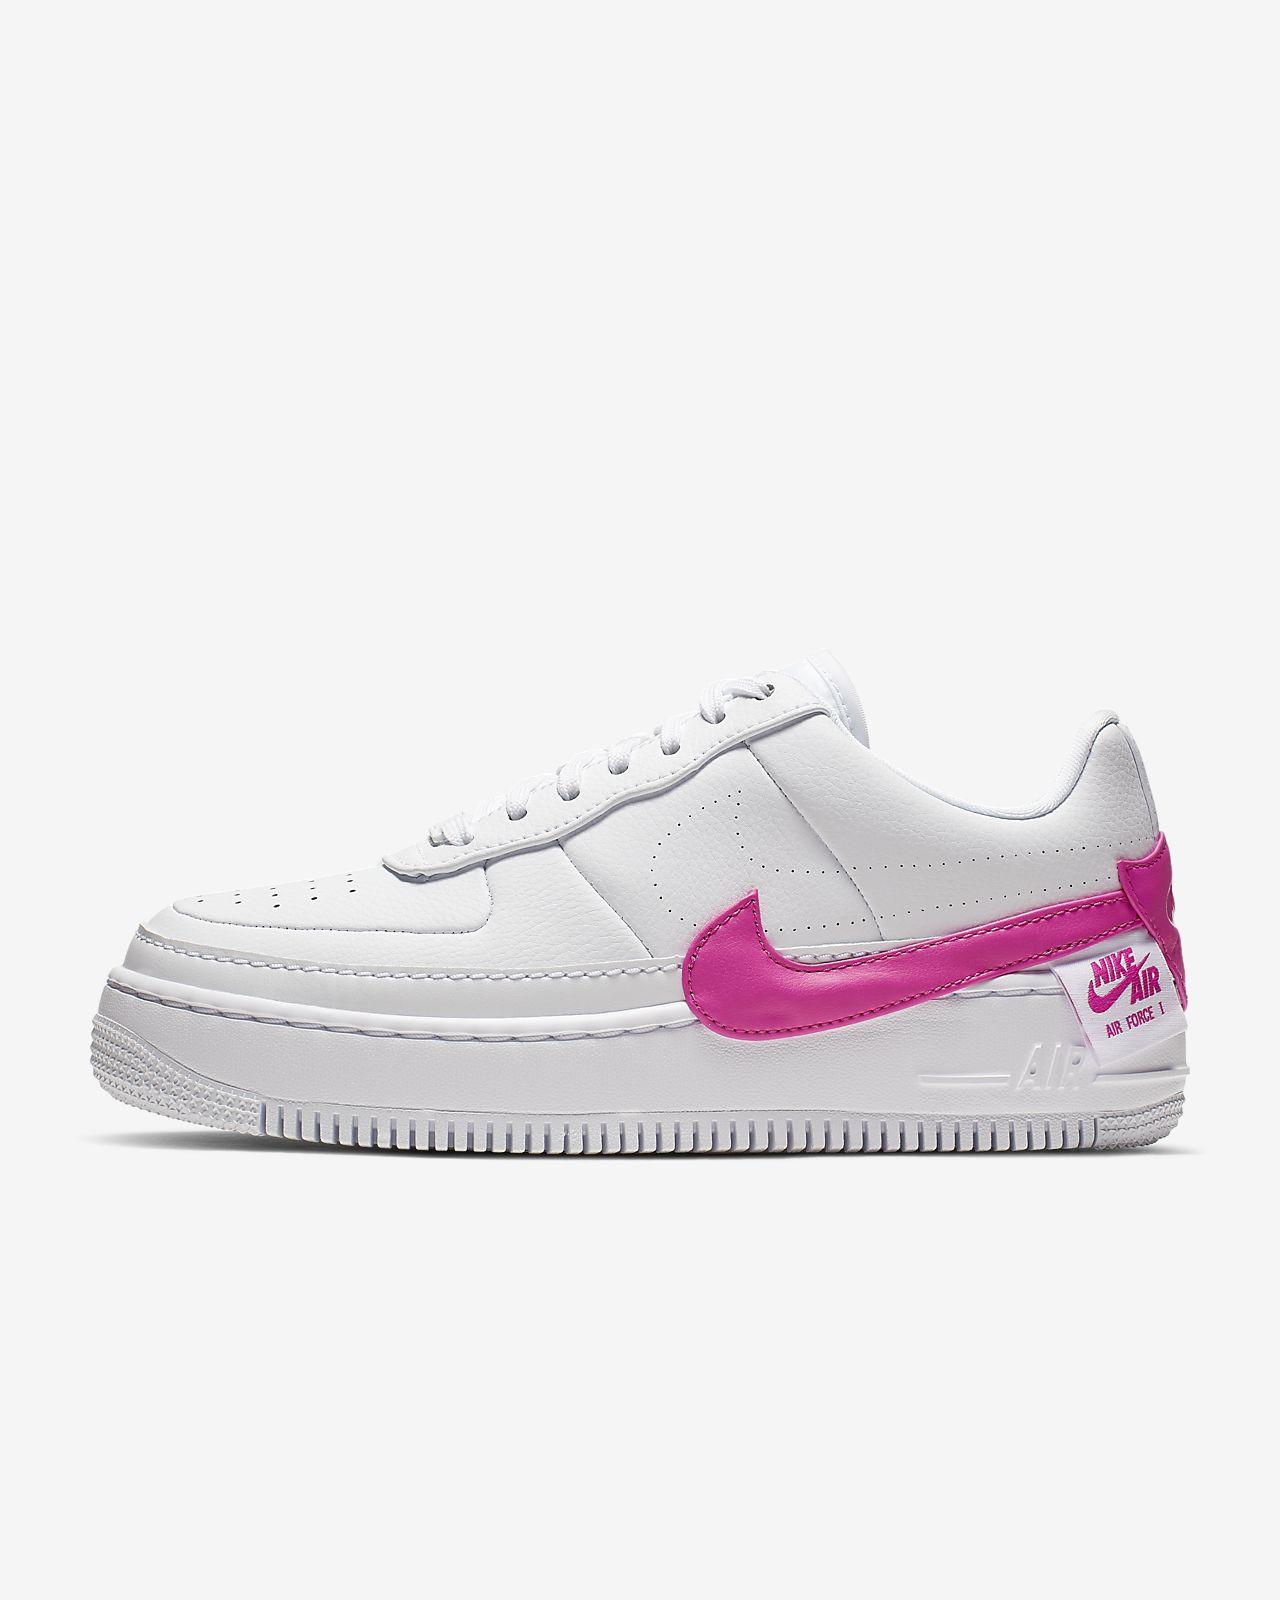 promo code 89d25 65a79 ... Sko Nike Air Force 1 Jester XX